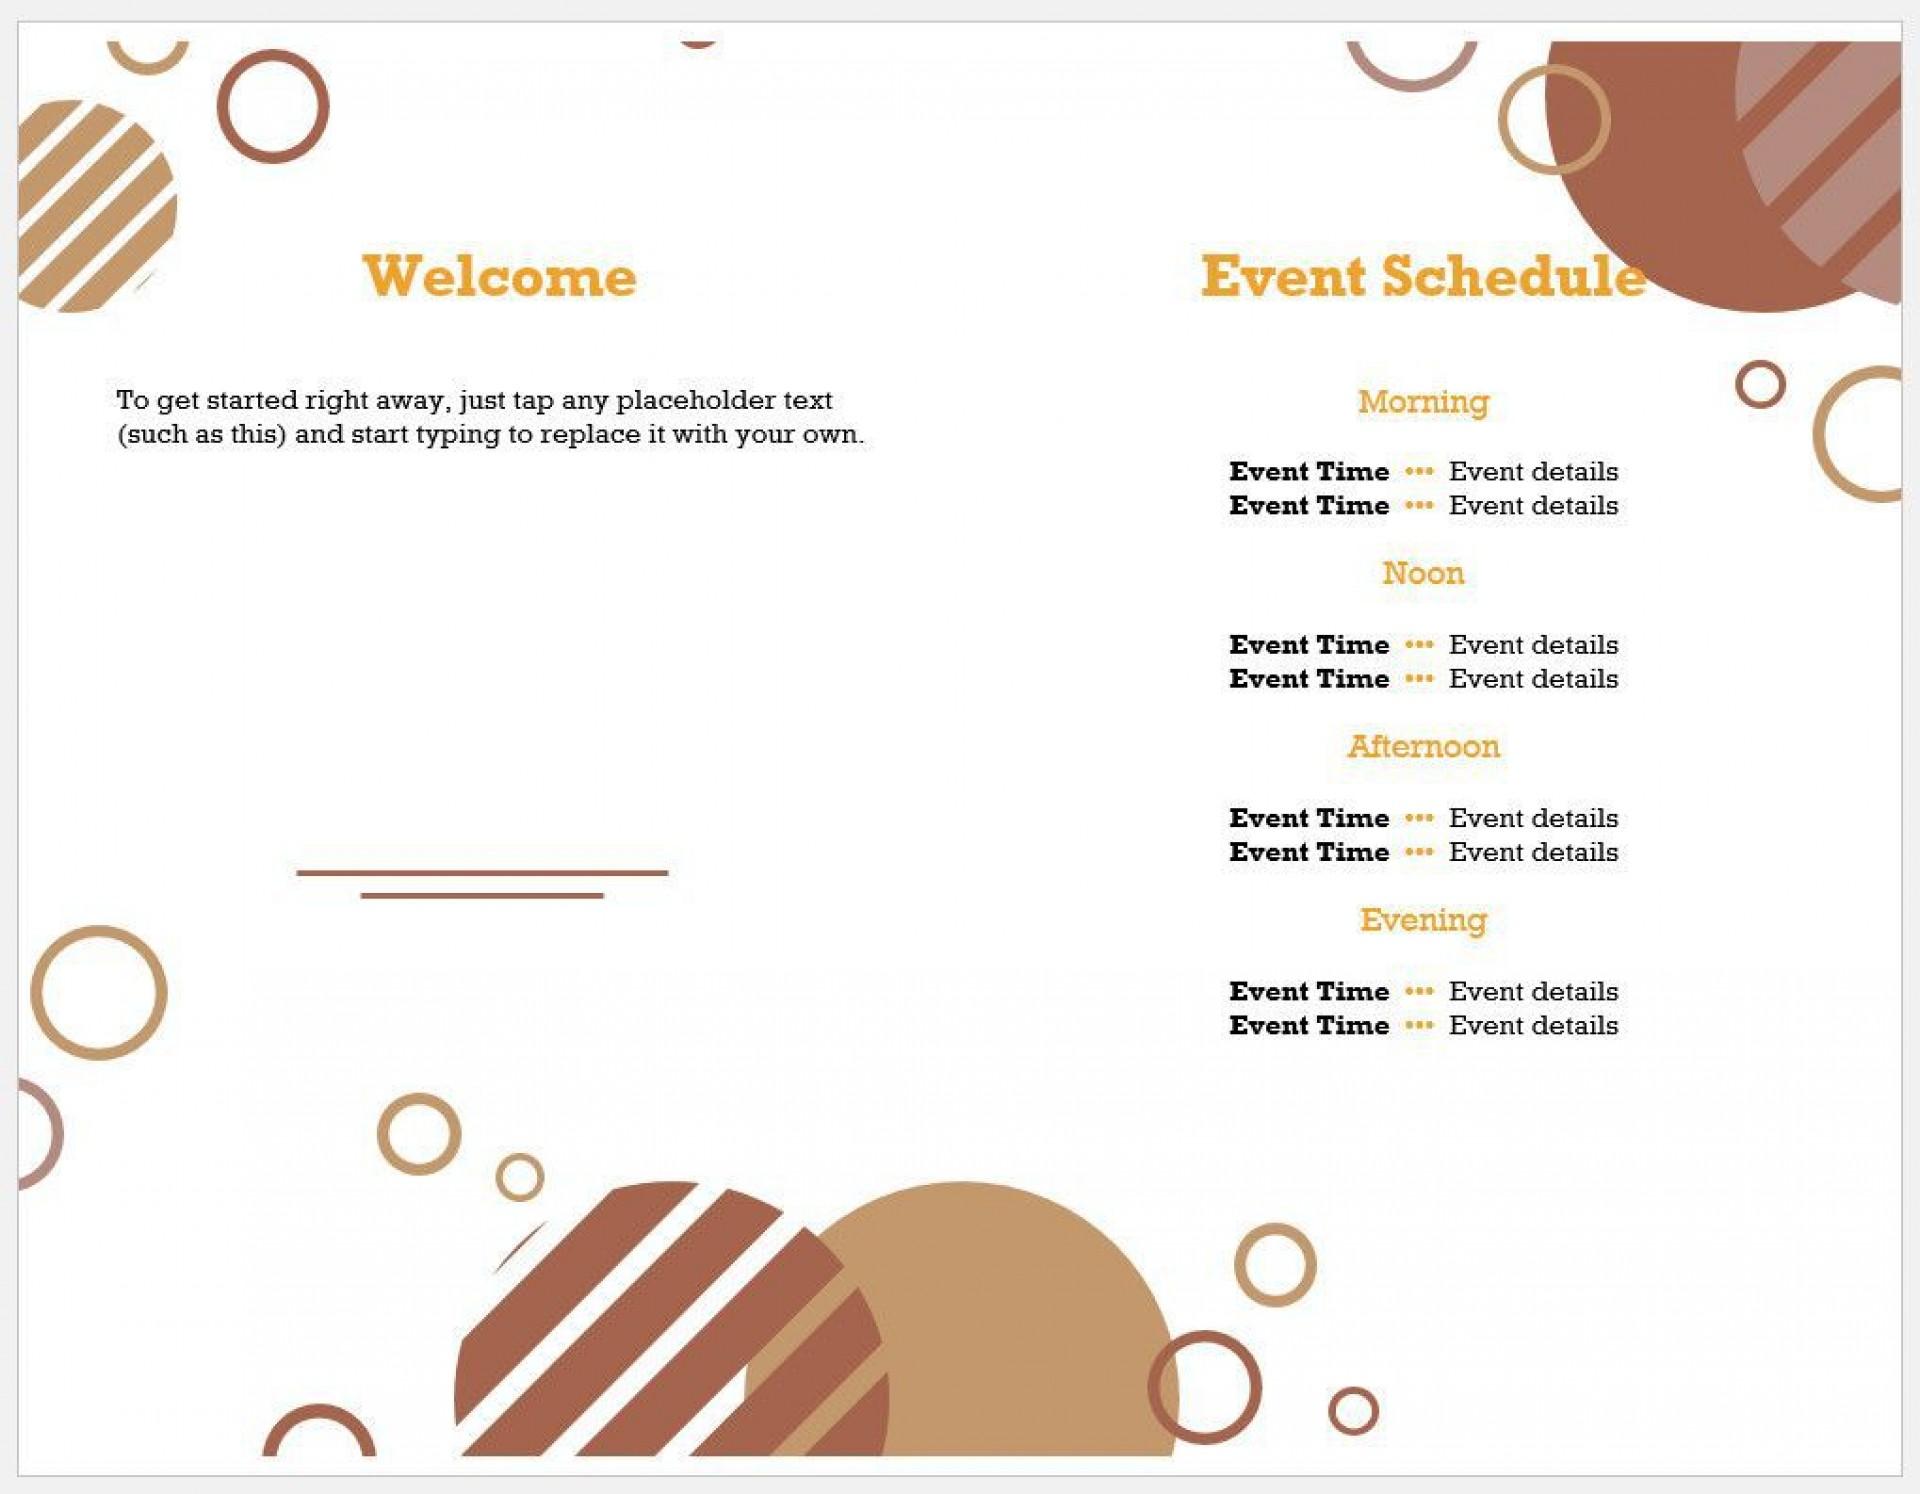 005 Amazing Free Event Program Template Concept  Templates Half Fold Online Download1920